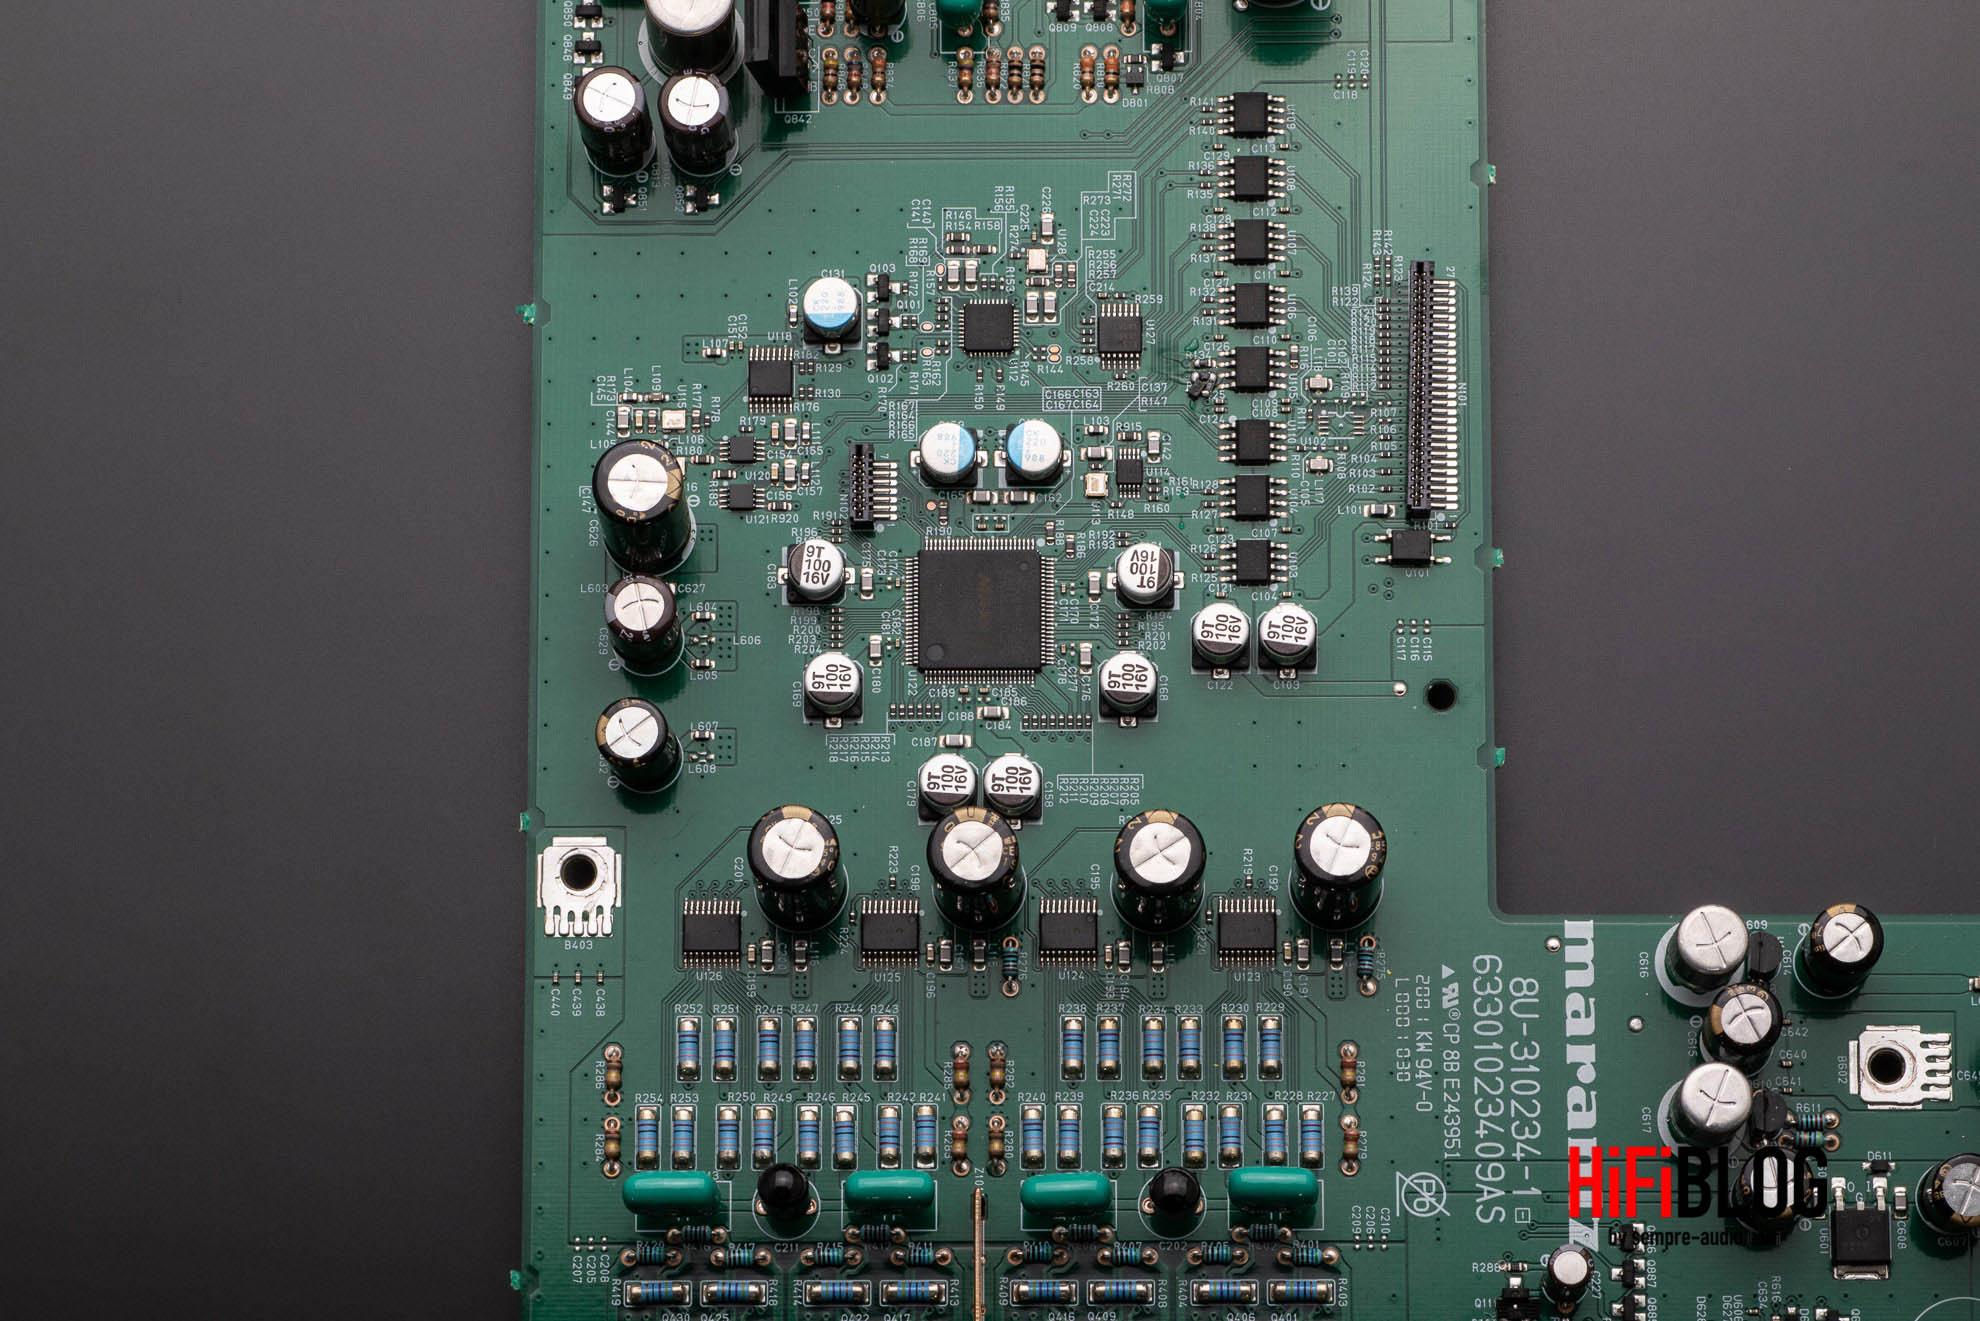 Marantz Model 30 Integrated Amplifier and SACD 30n Network SACD Player 56